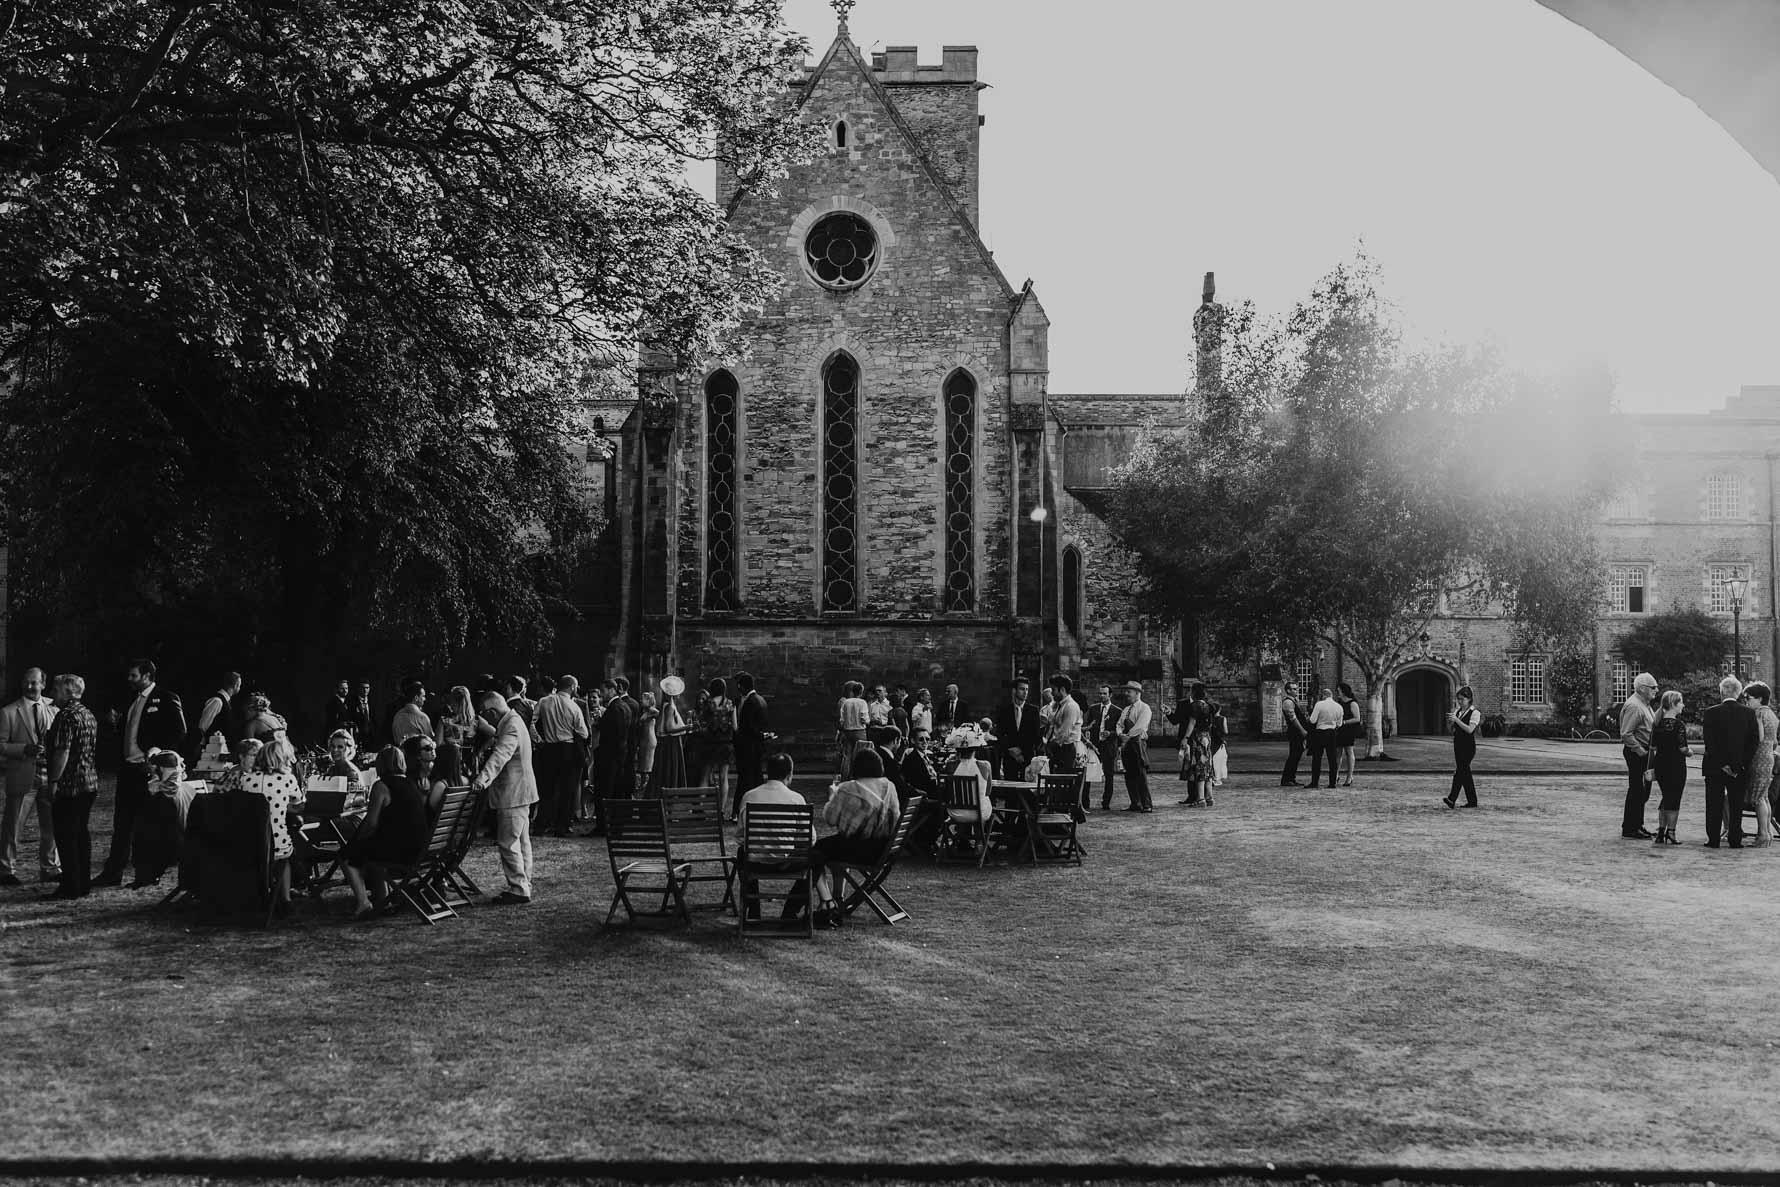 Wide shot of jesus college Cambridge